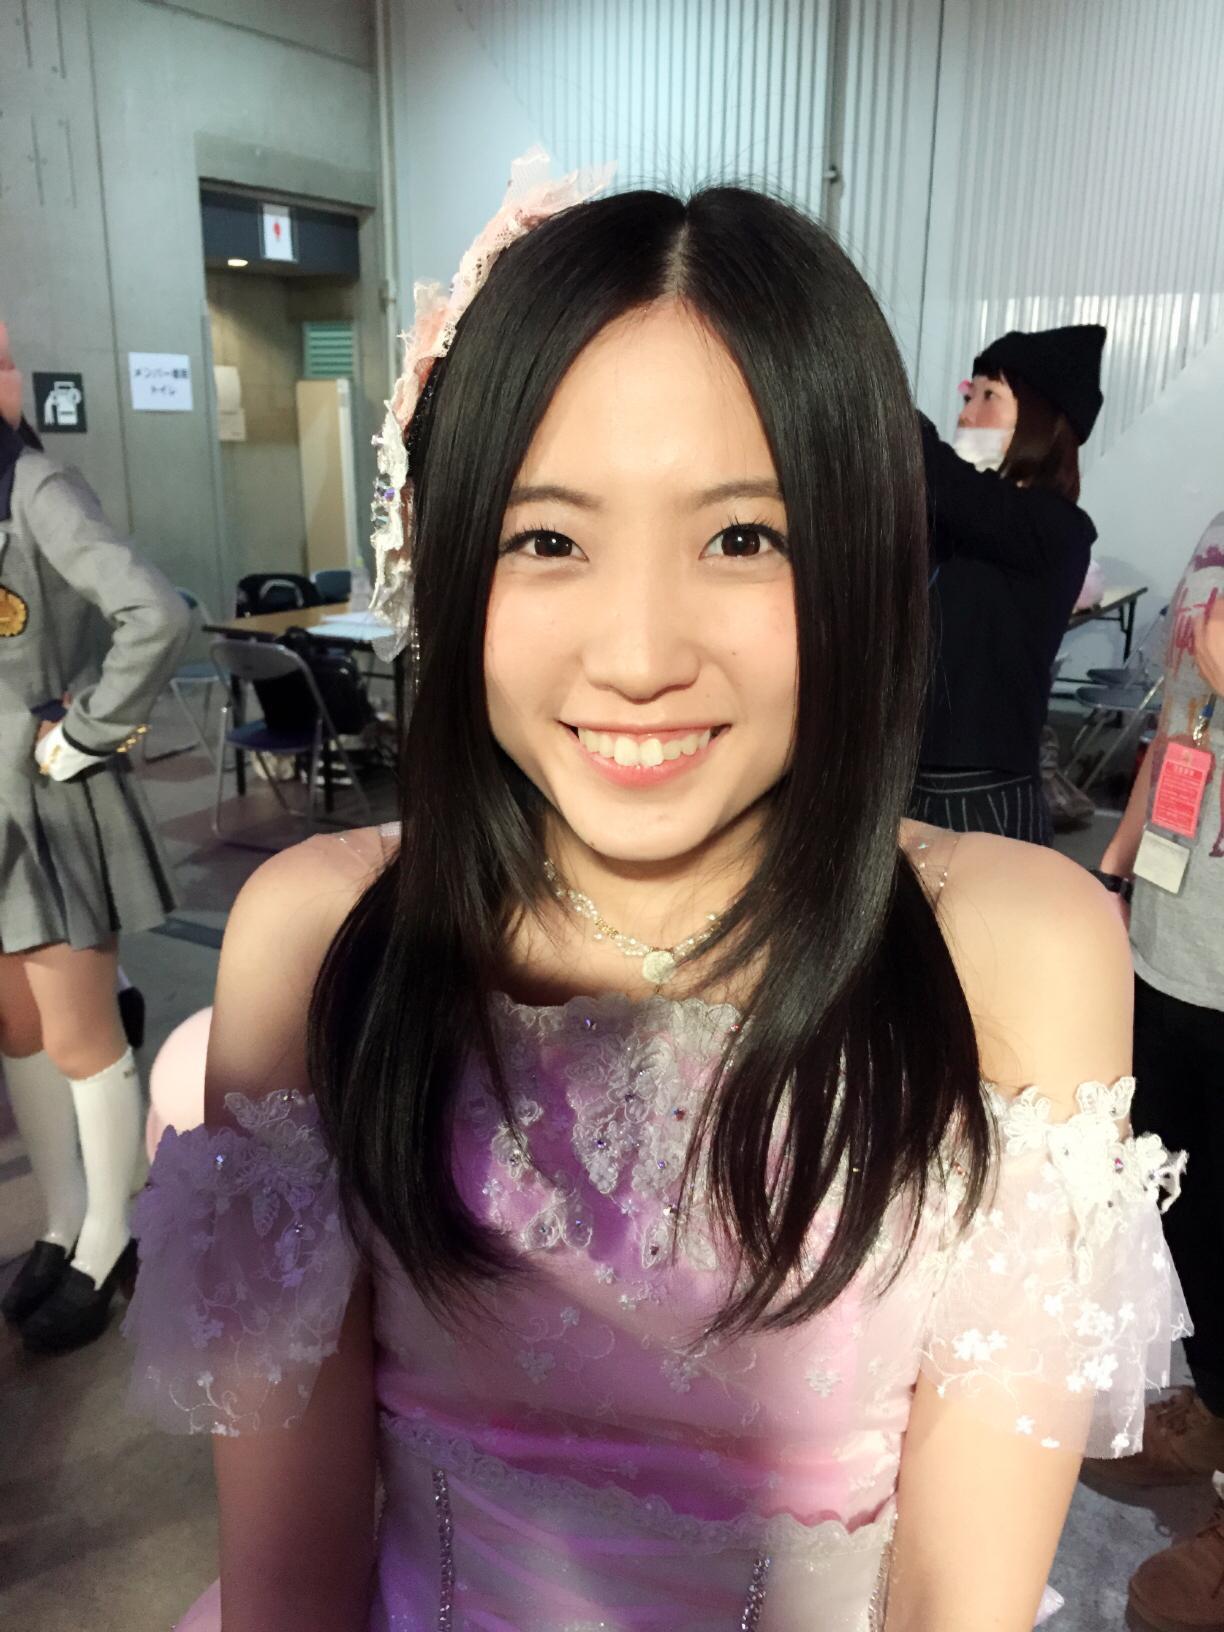 SKE48古川愛李の卒業は彼氏が原因?!?!古川愛李の彼氏は誰??のサムネイル画像